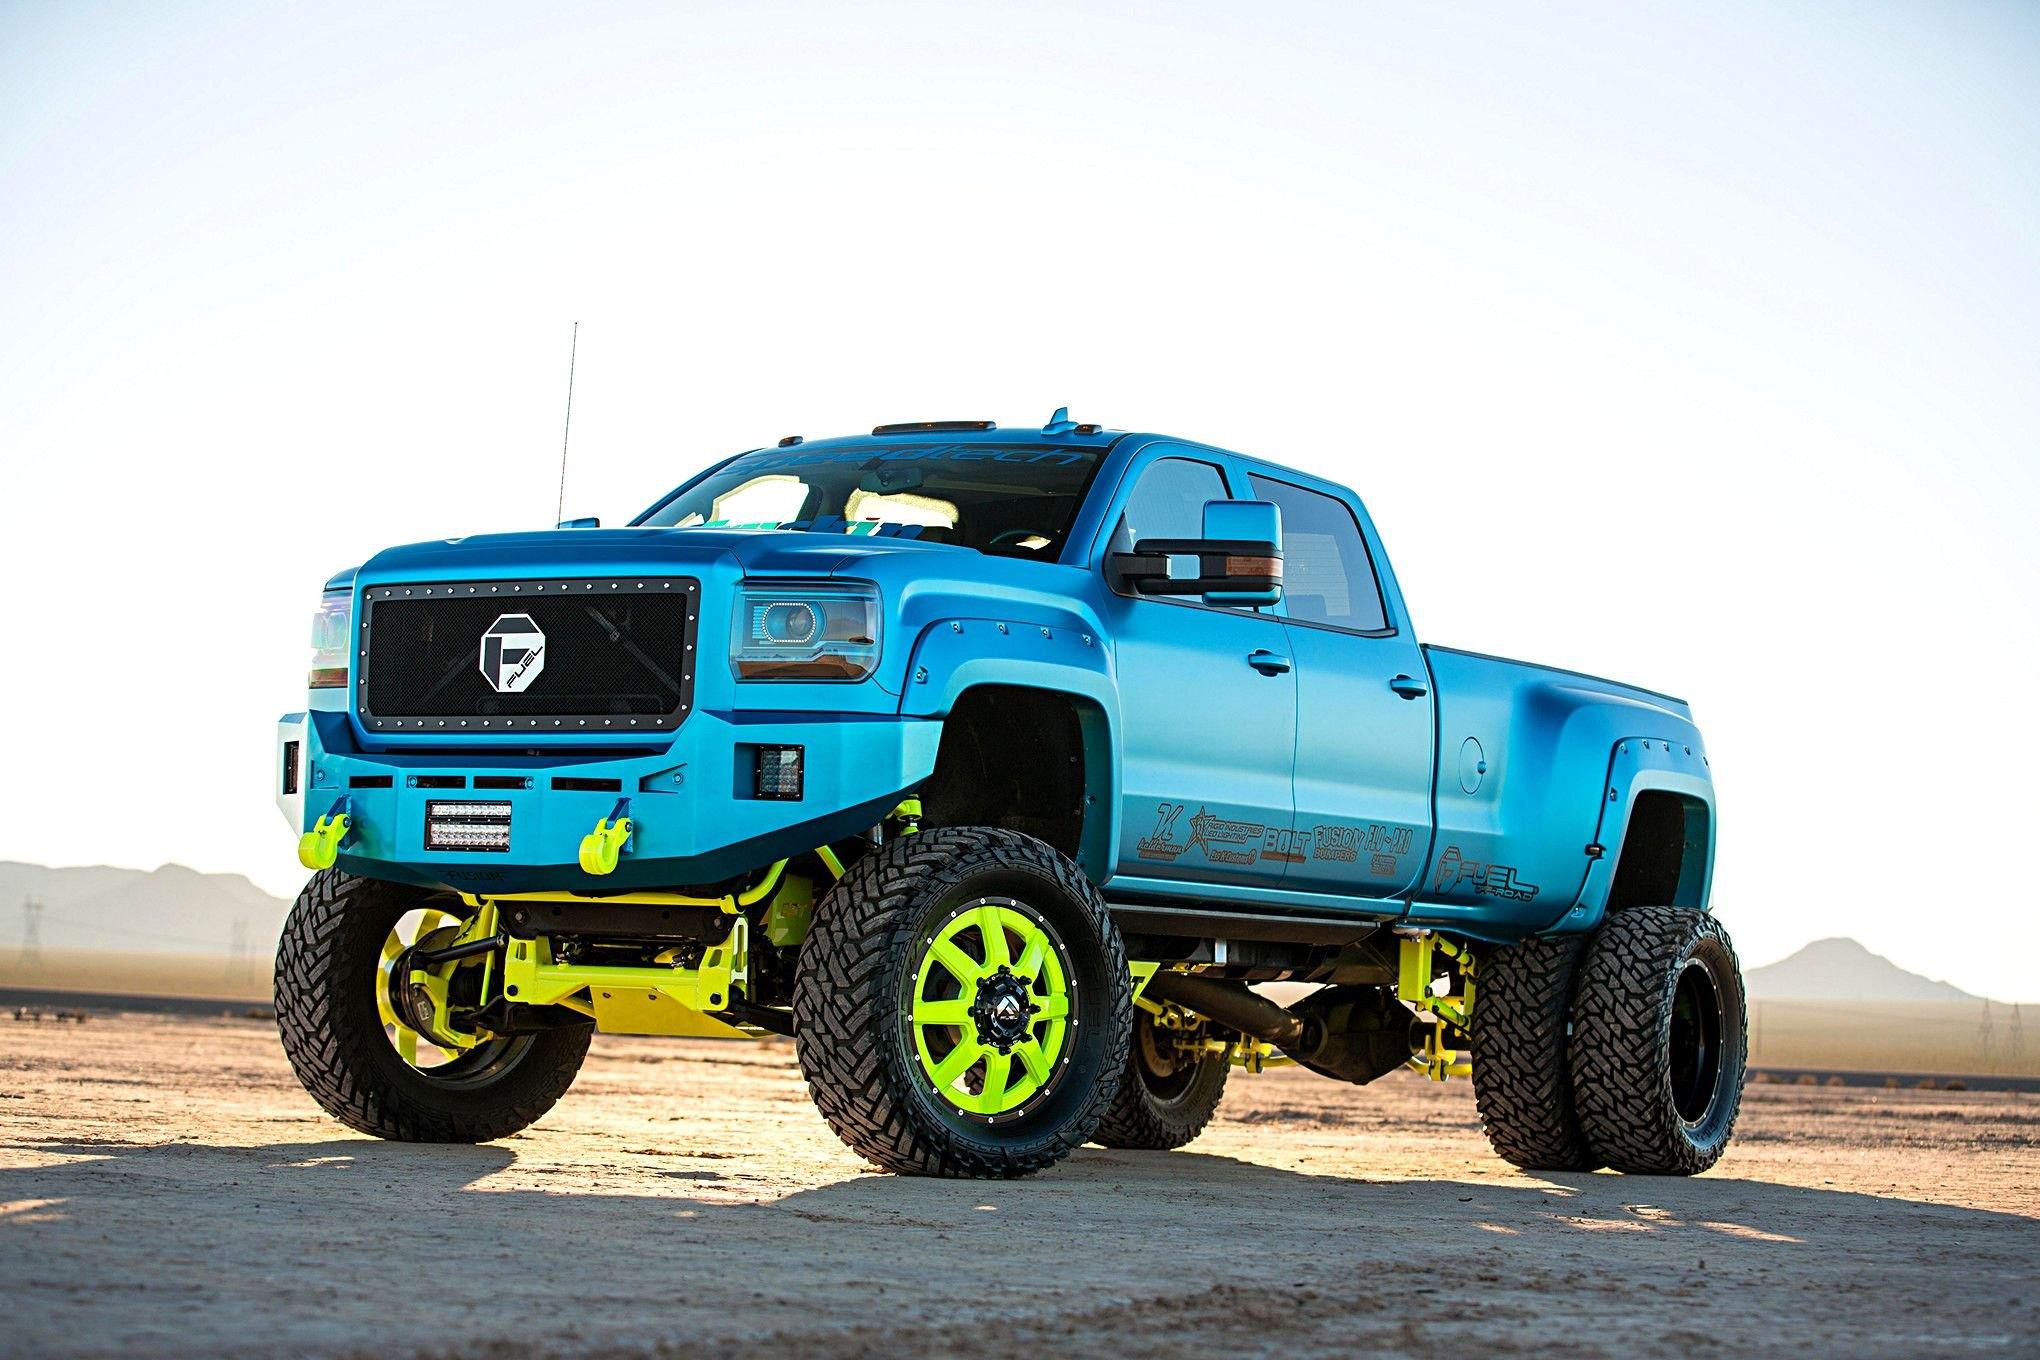 onyx duramax sale automatic denali truck engine sierra used ok turbodiesel black for pauls valley gmc in door